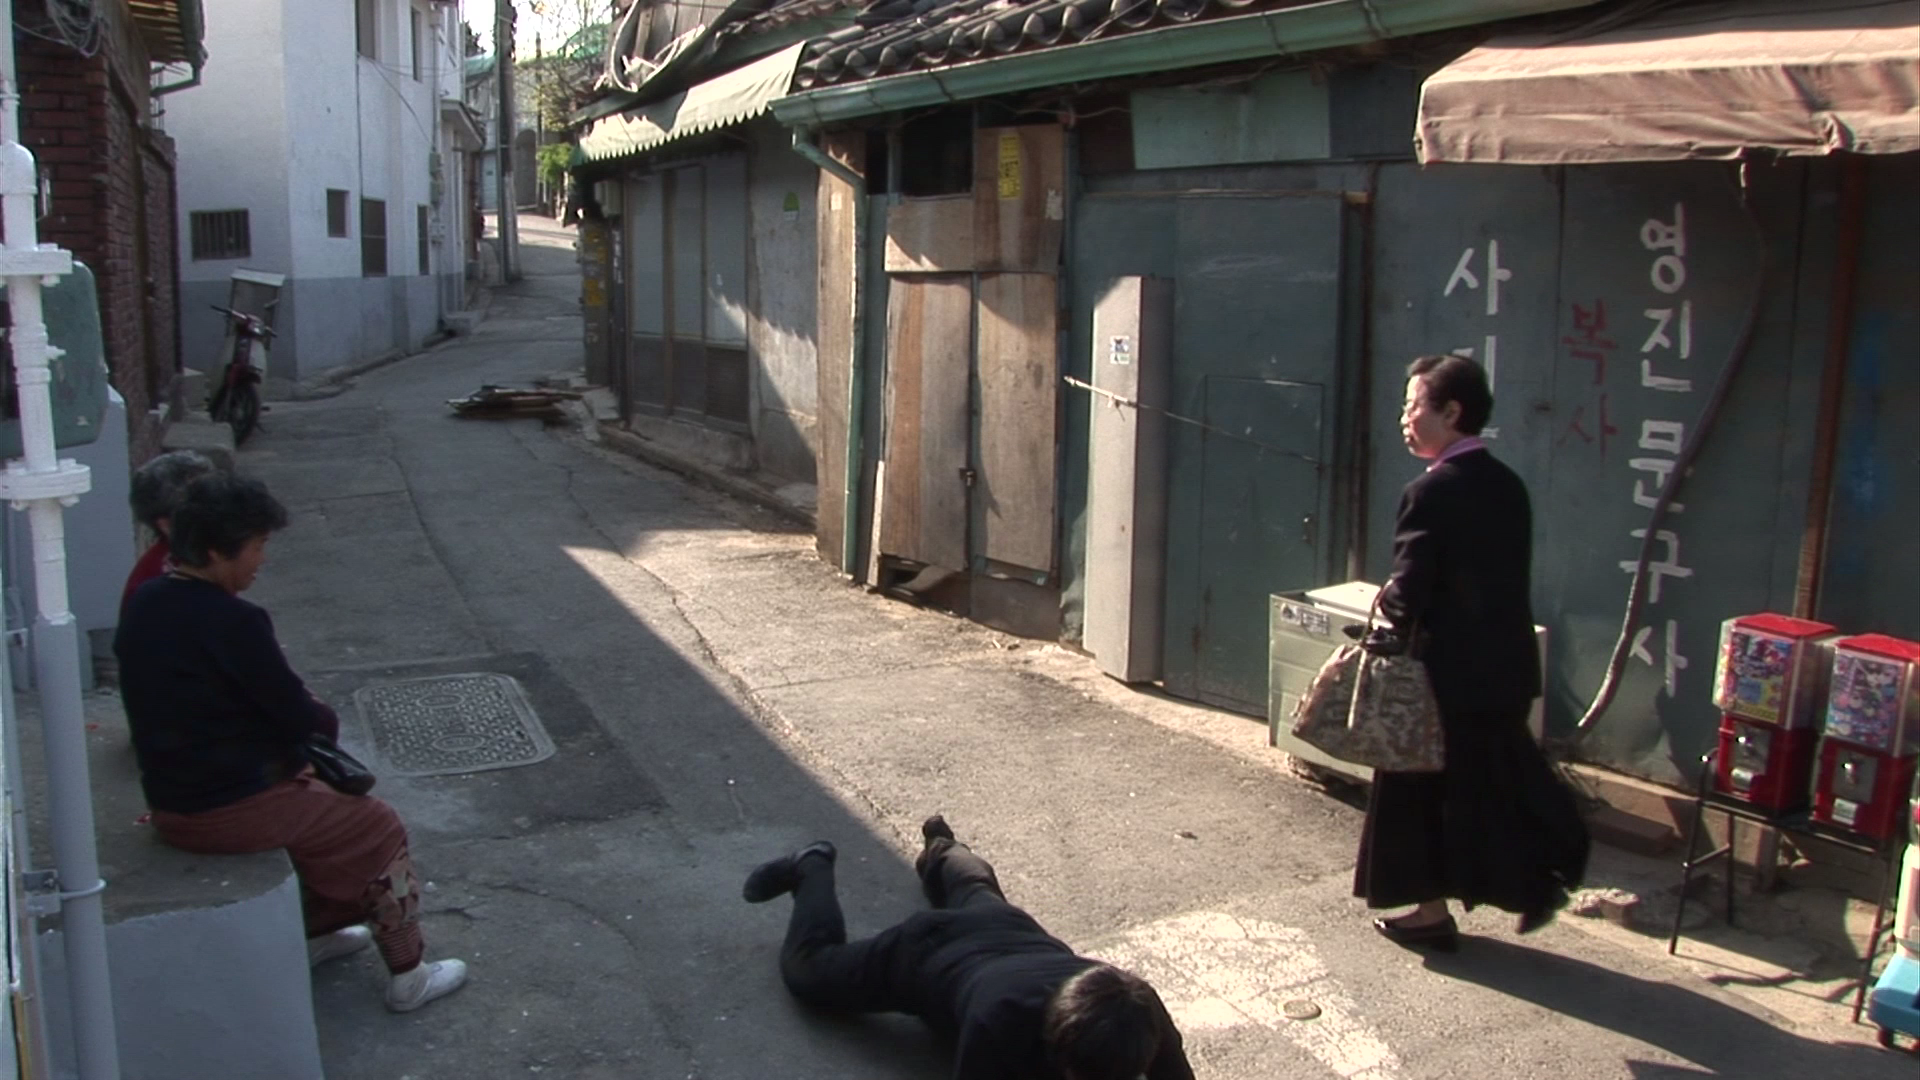 Jin-me Yoon, As It Is Becoming (Seoul, Korea) (still), 2008, 12 single channel HD videos, 9 minutes, 2 seconds by